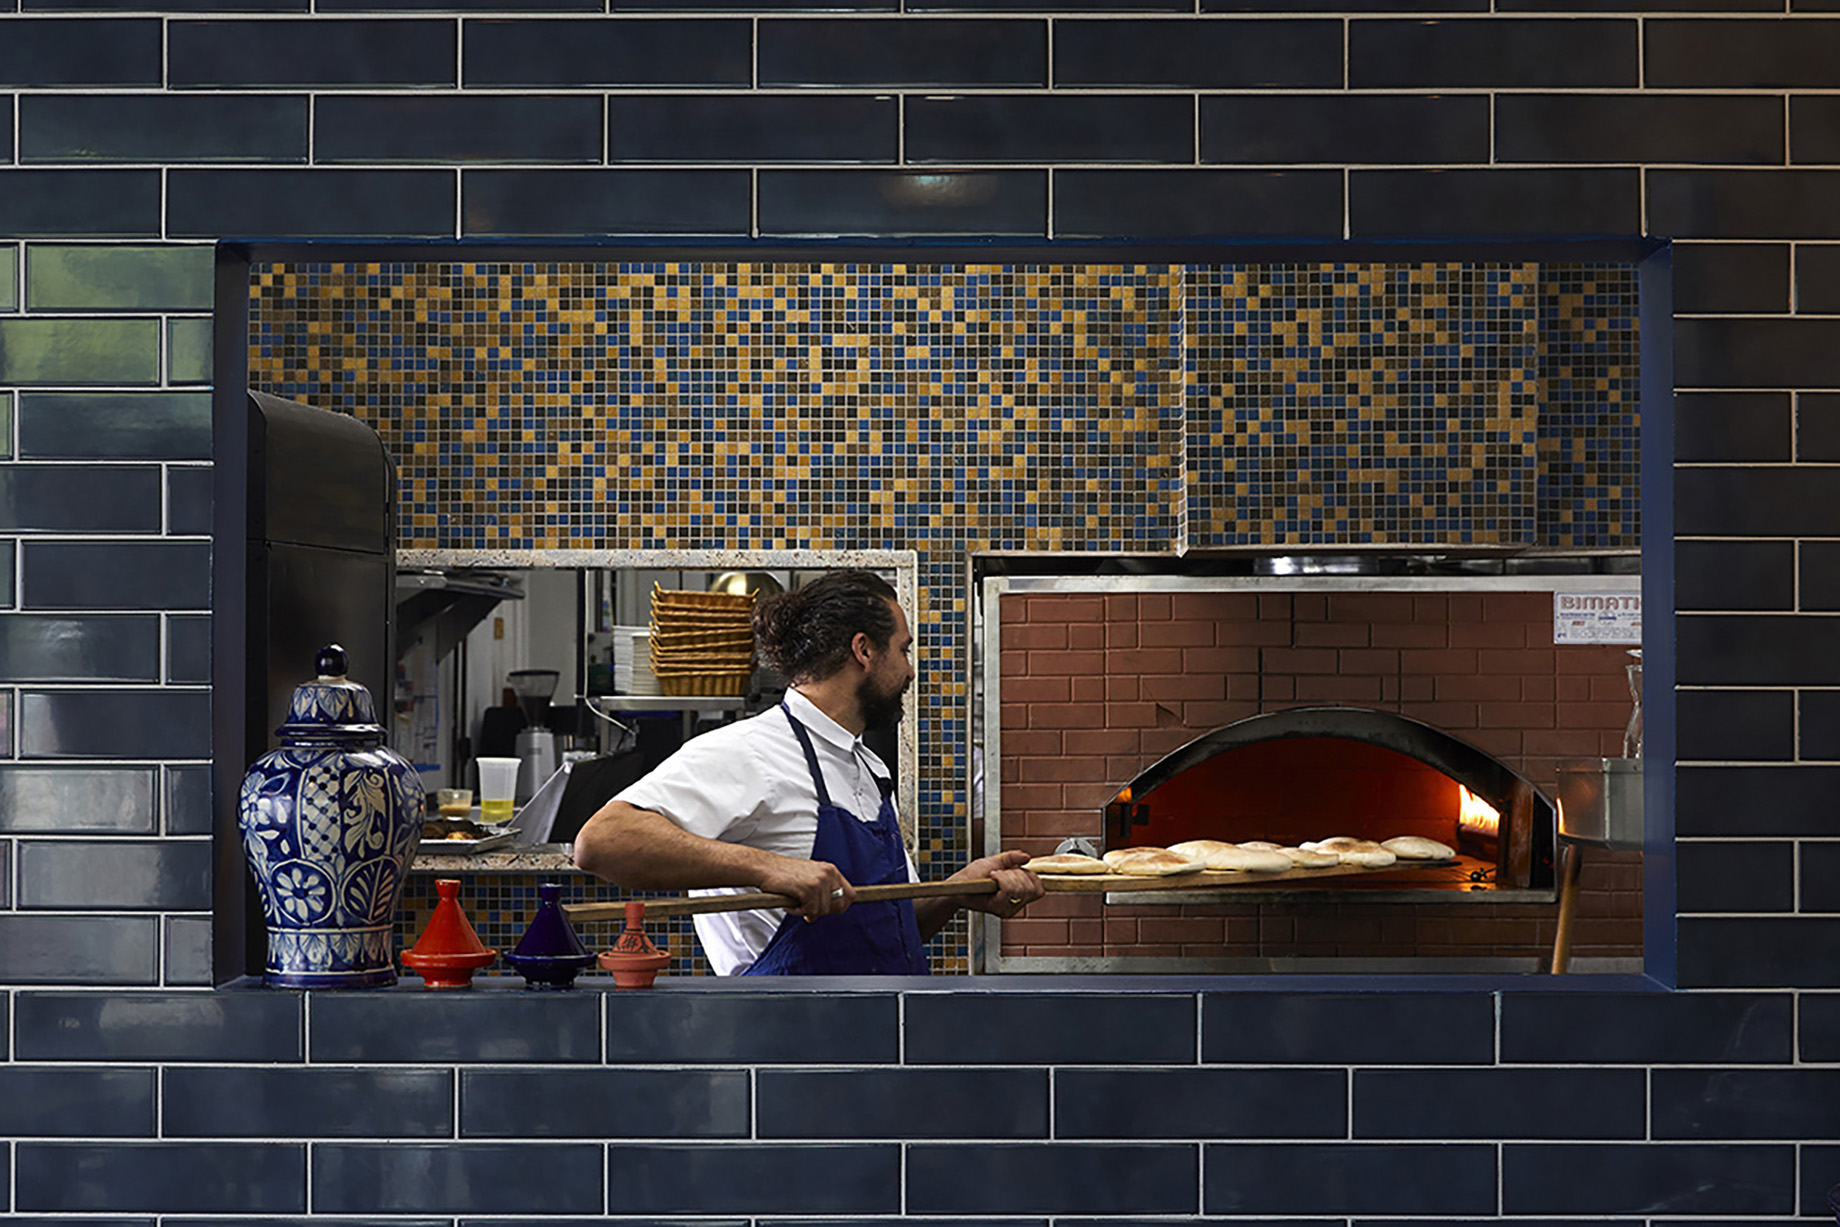 Chef pulling bread from brick oven in kitchen for Atlanta magazine 13 best restaurants shot by Bailey Garrot